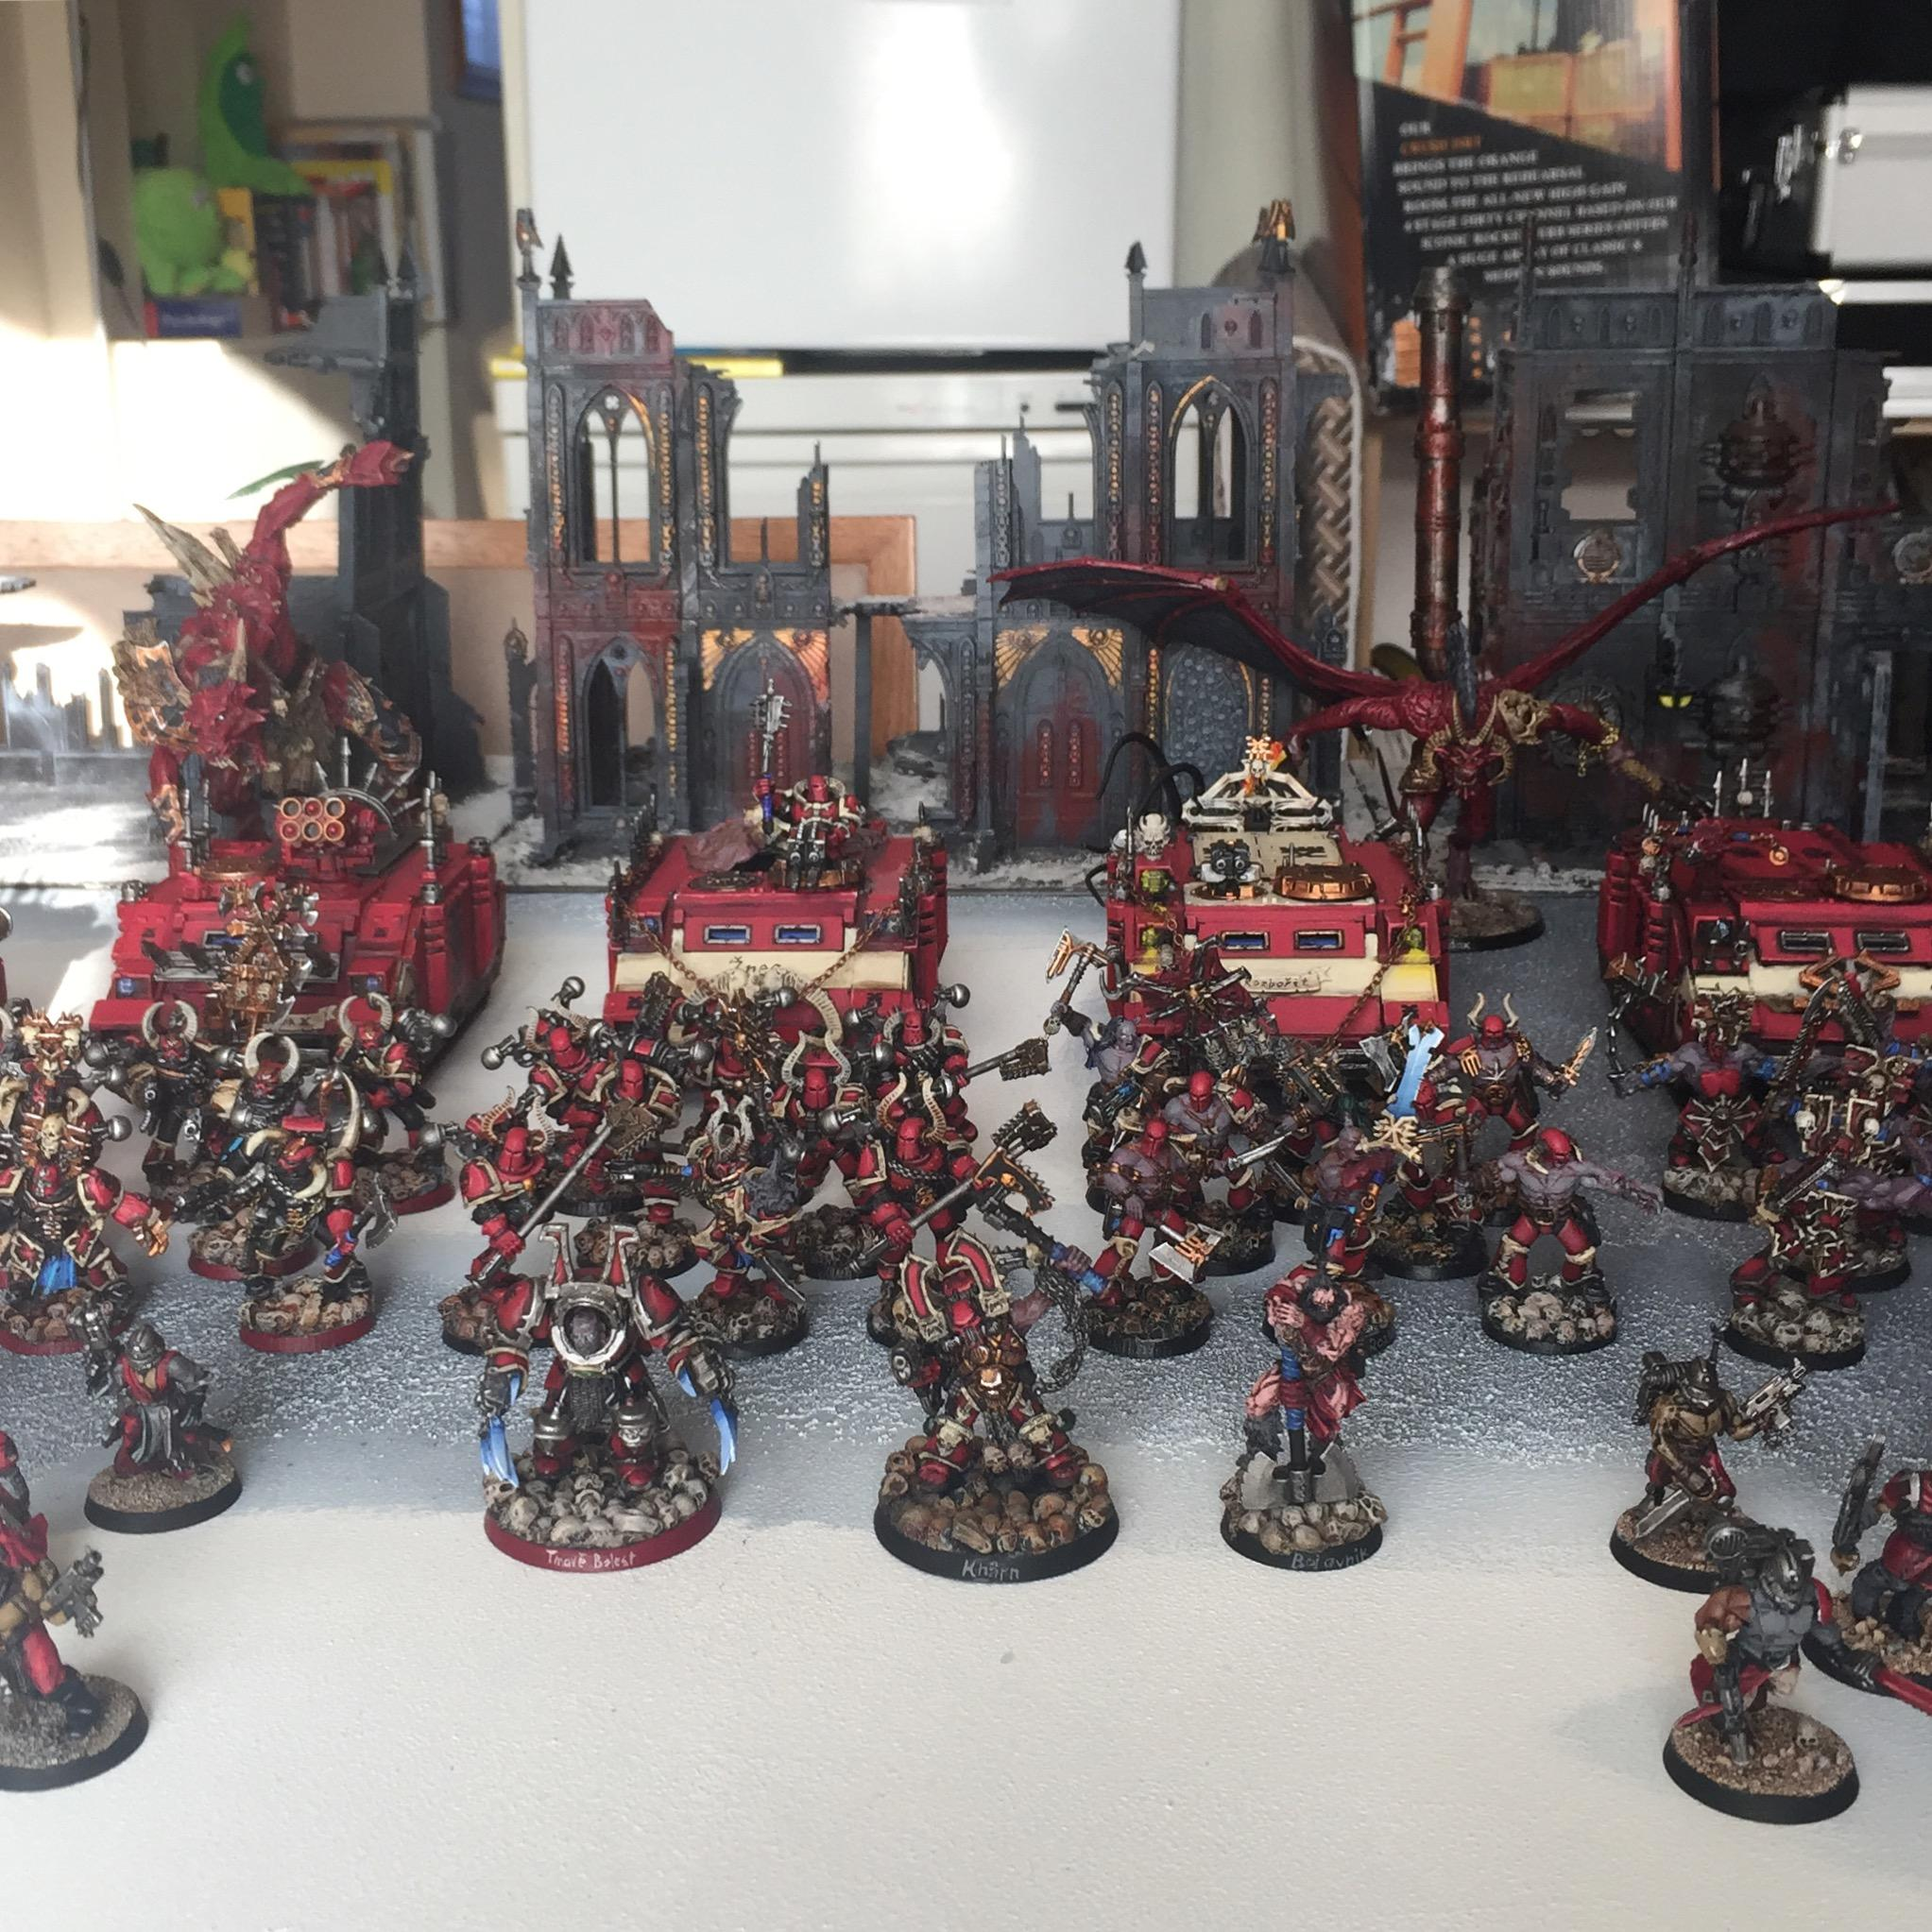 Army, Berserkers, Chaos Space Marines, Daemonkin, Khorne, Warhammer 40,000, World Eaters